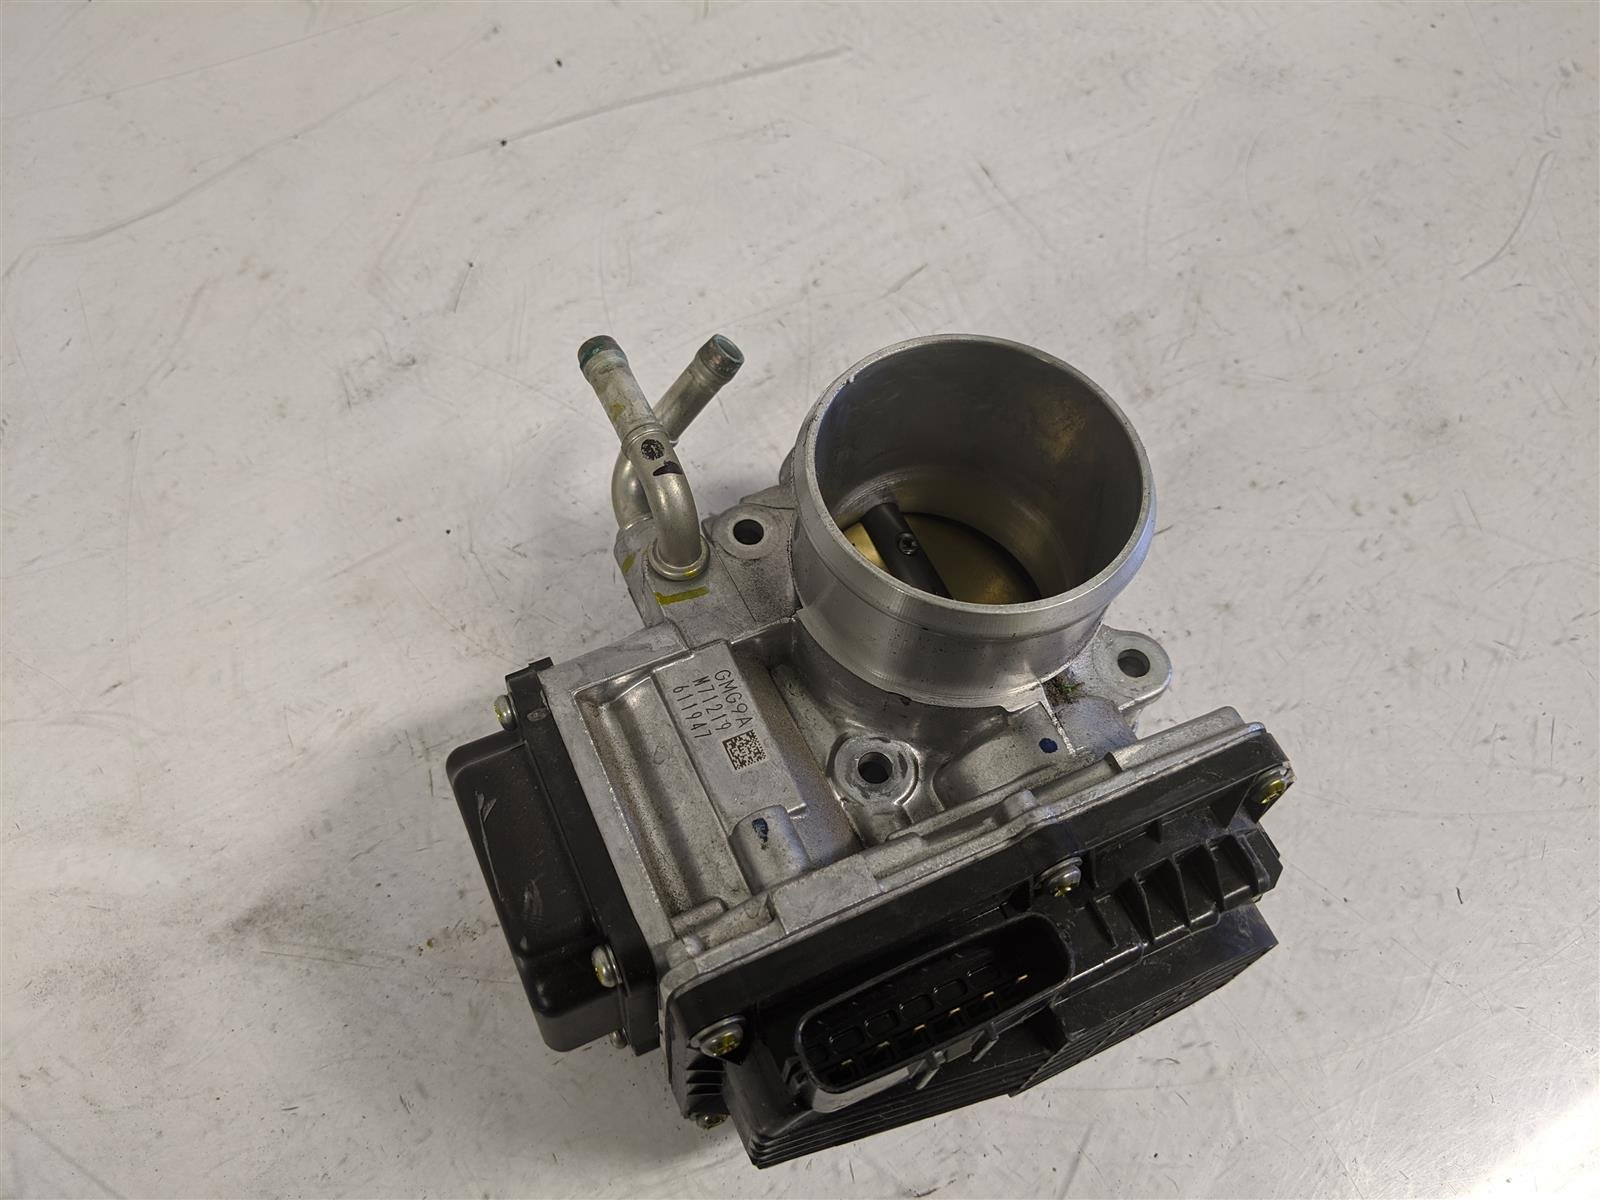 2018 Honda Accord 1.5l Throttle Body Replacement